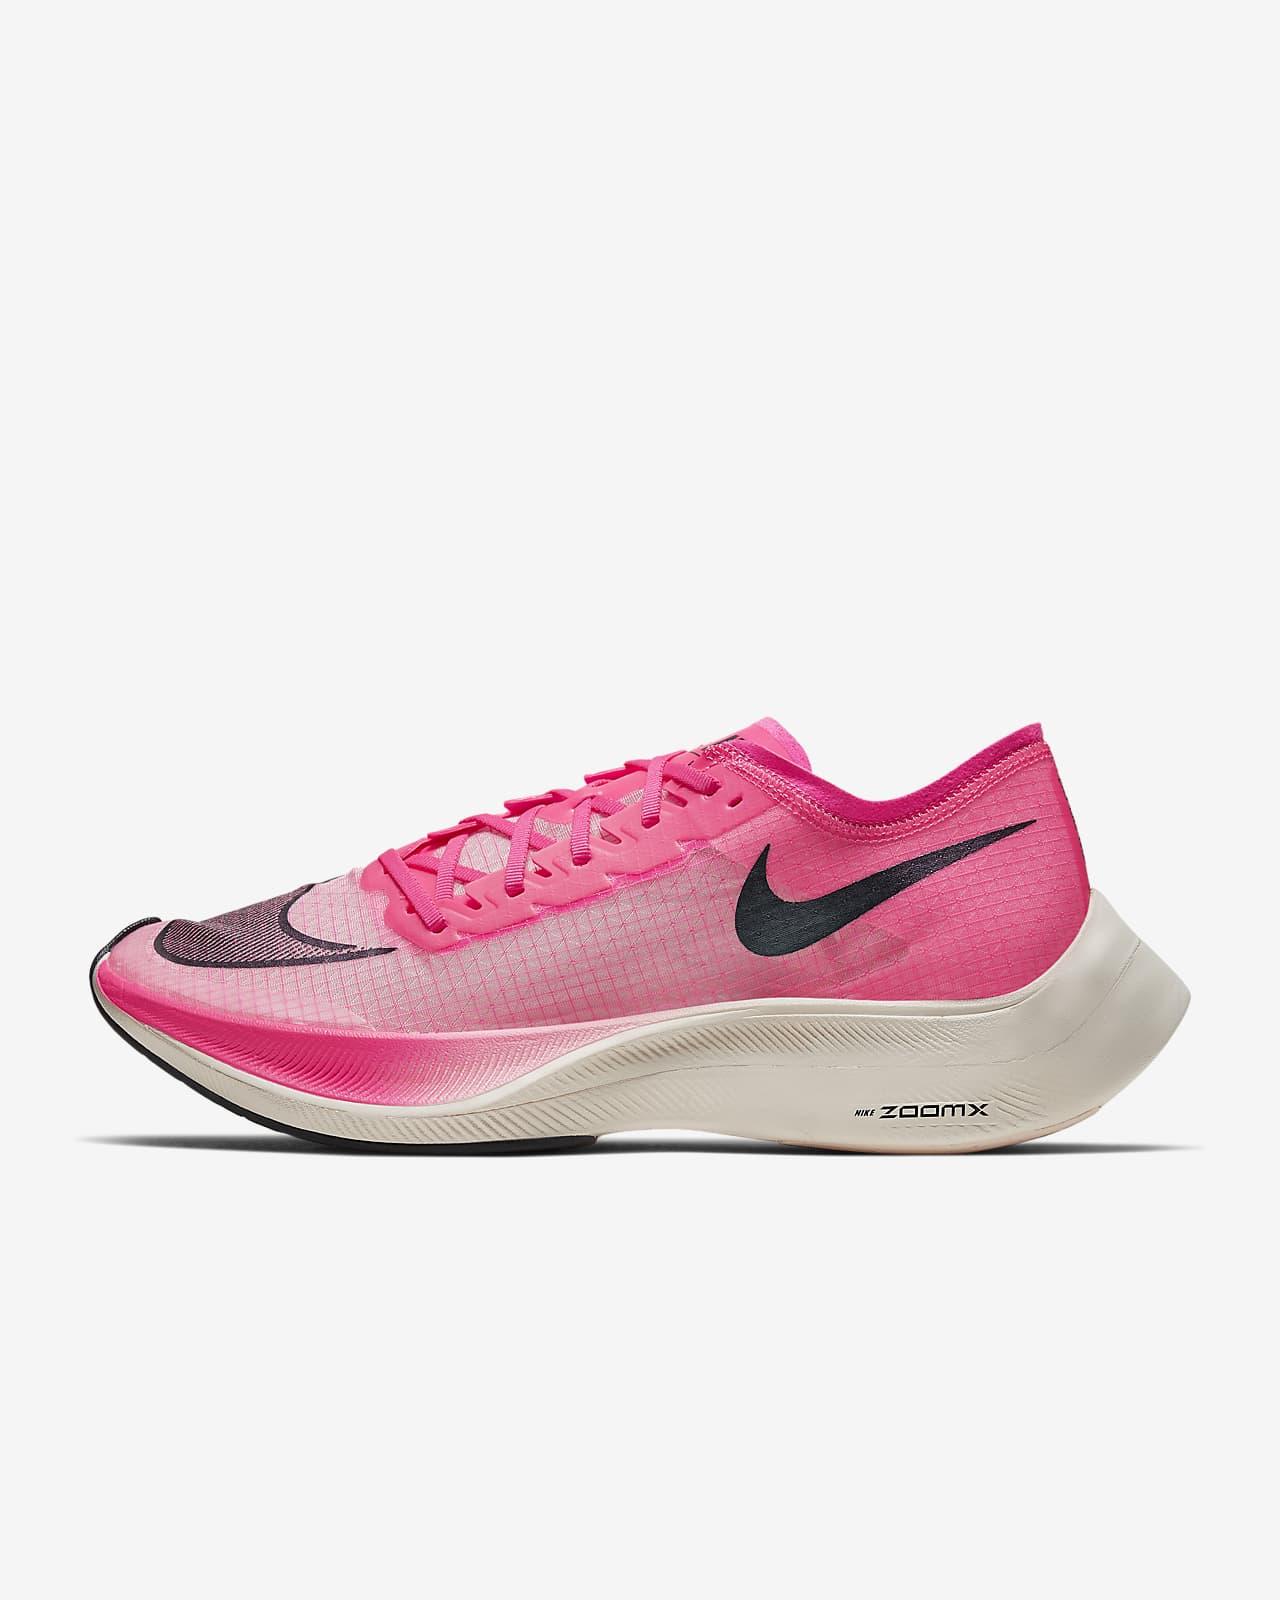 Nike ZoomX Vaporfly NEXT% 男/女跑步鞋